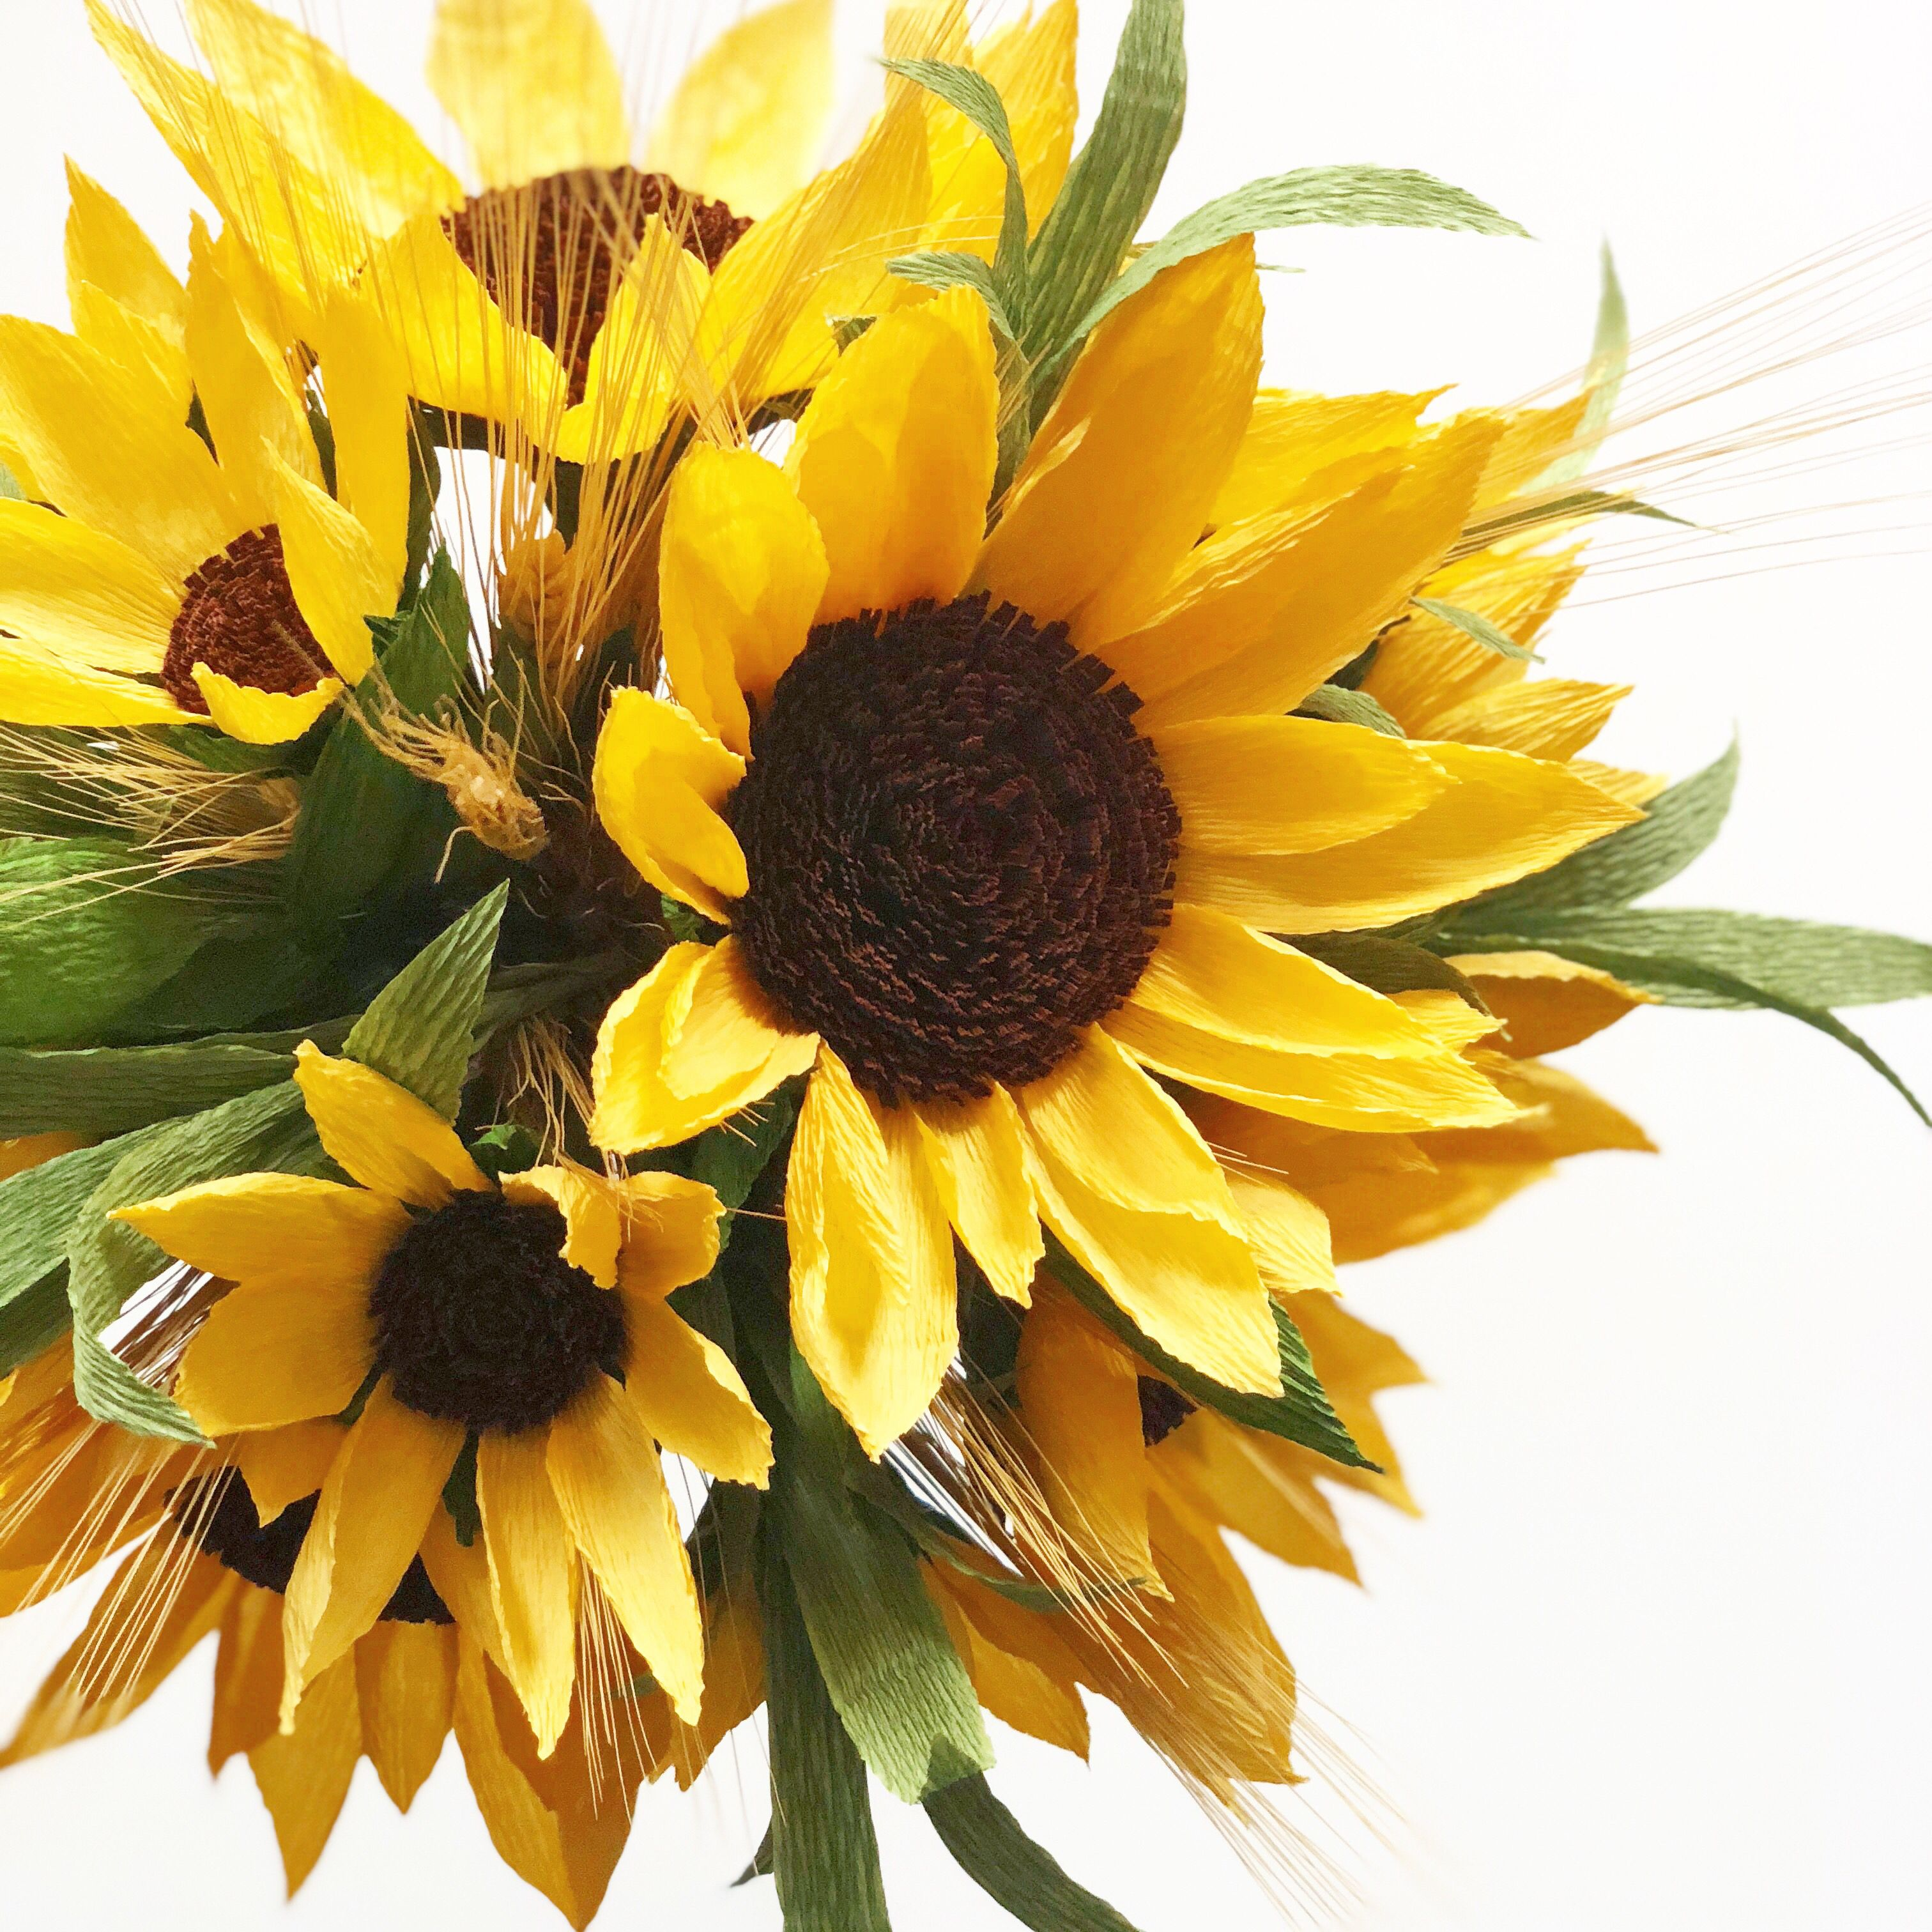 Little Paper Flowers Paper Sunflowers Flower Drawing Paper Flower Art